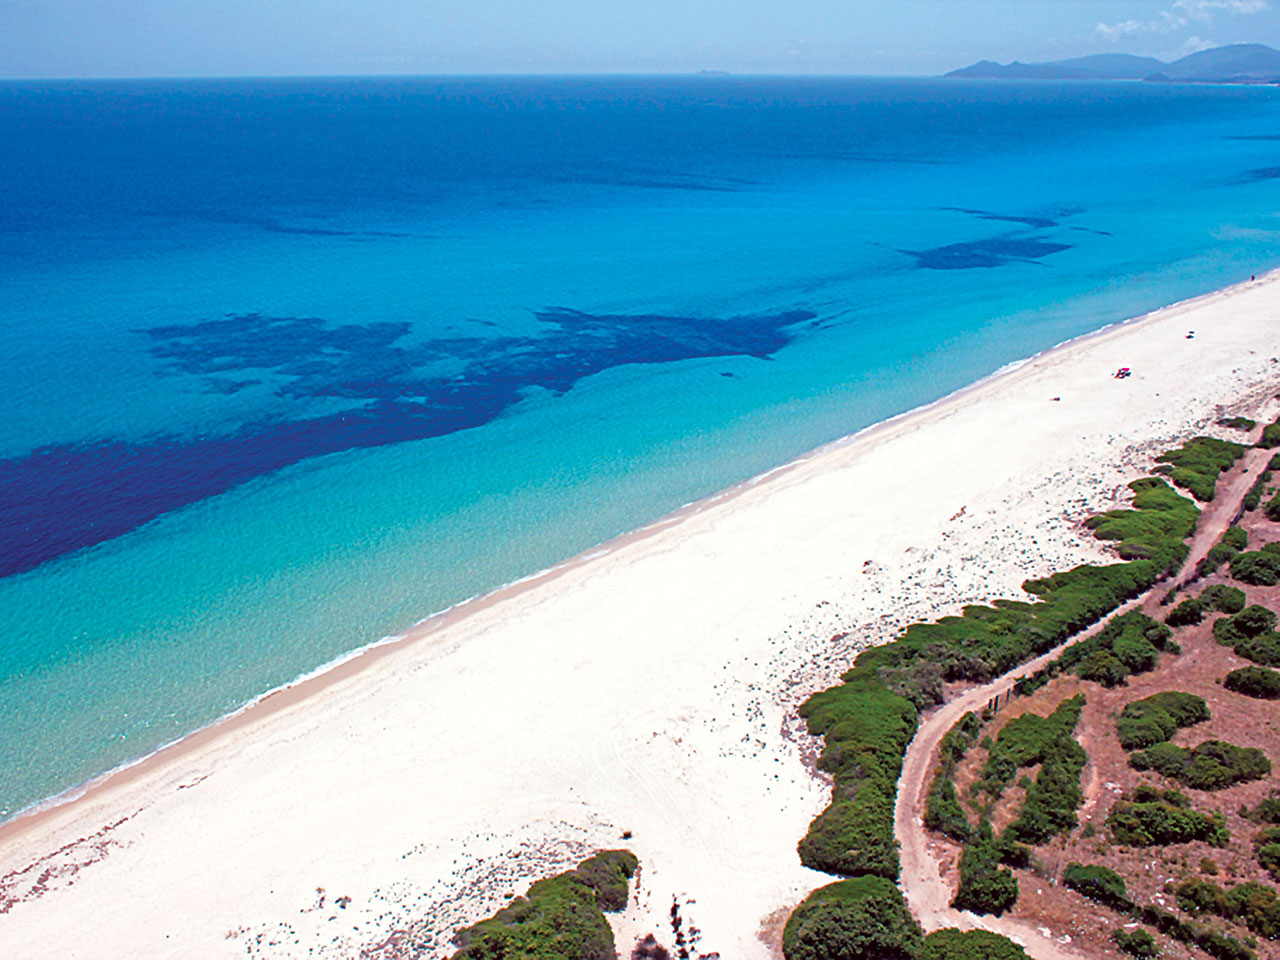 Beach resorts in Italy: brief information